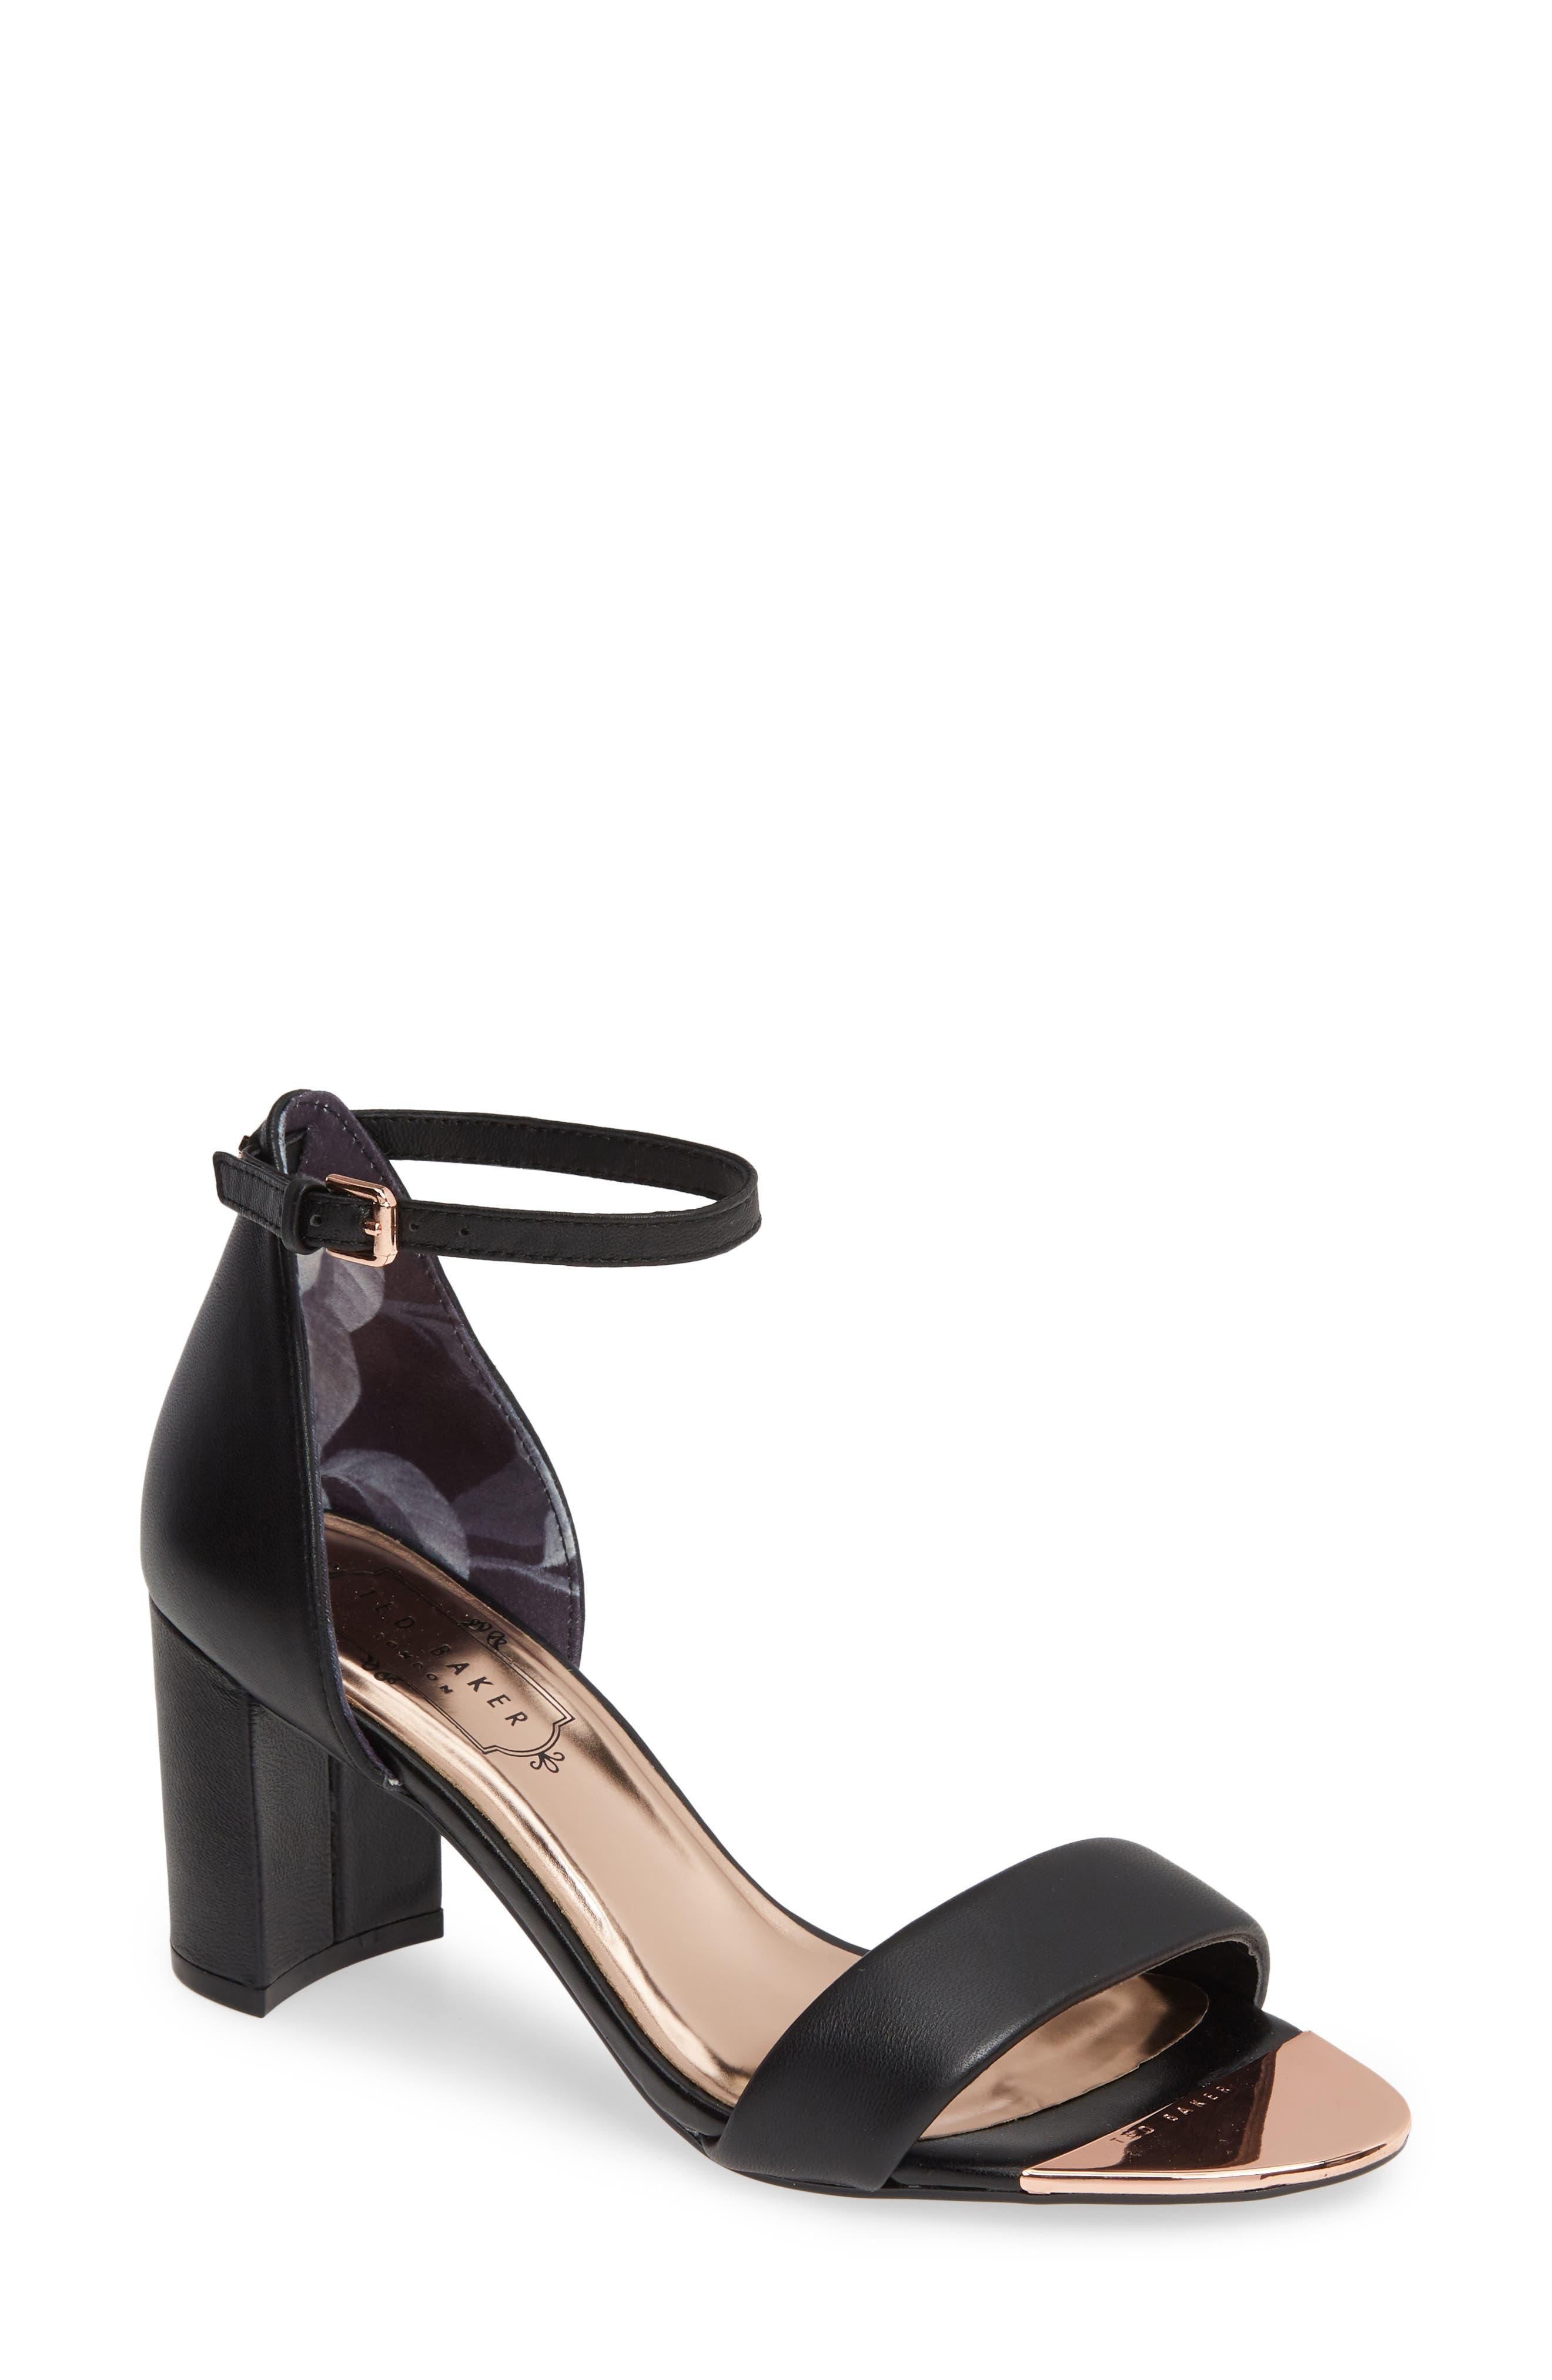 Shea Ankle Strap Sandal, Main, color, BLACK LEATHER